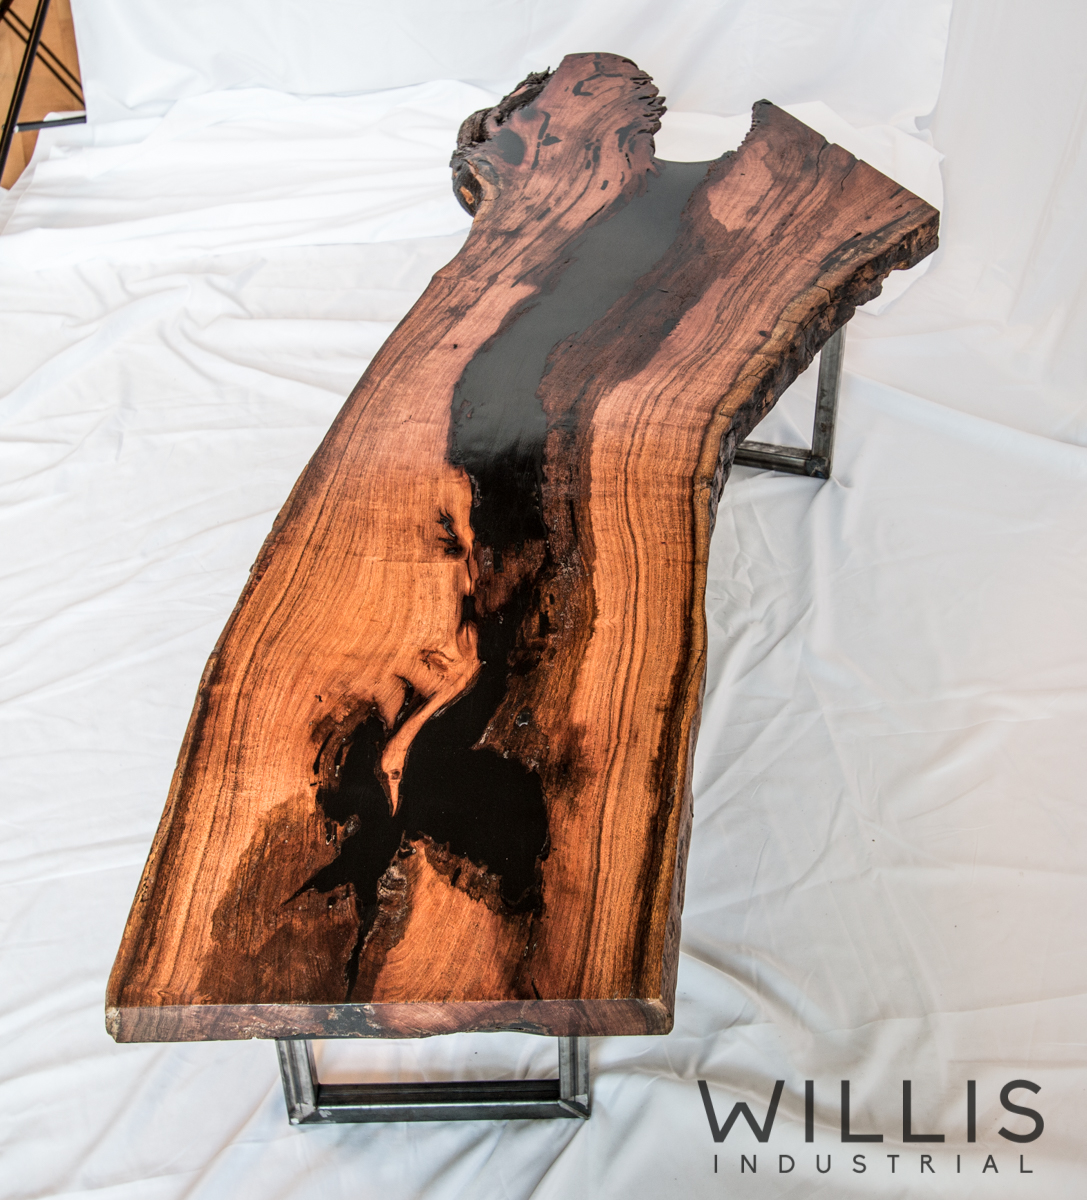 Willis Industrial Furniture | Rustic, Modern Furniture | TA_00014 Mesquite Slab Live Edge with Black Epoxy Filling